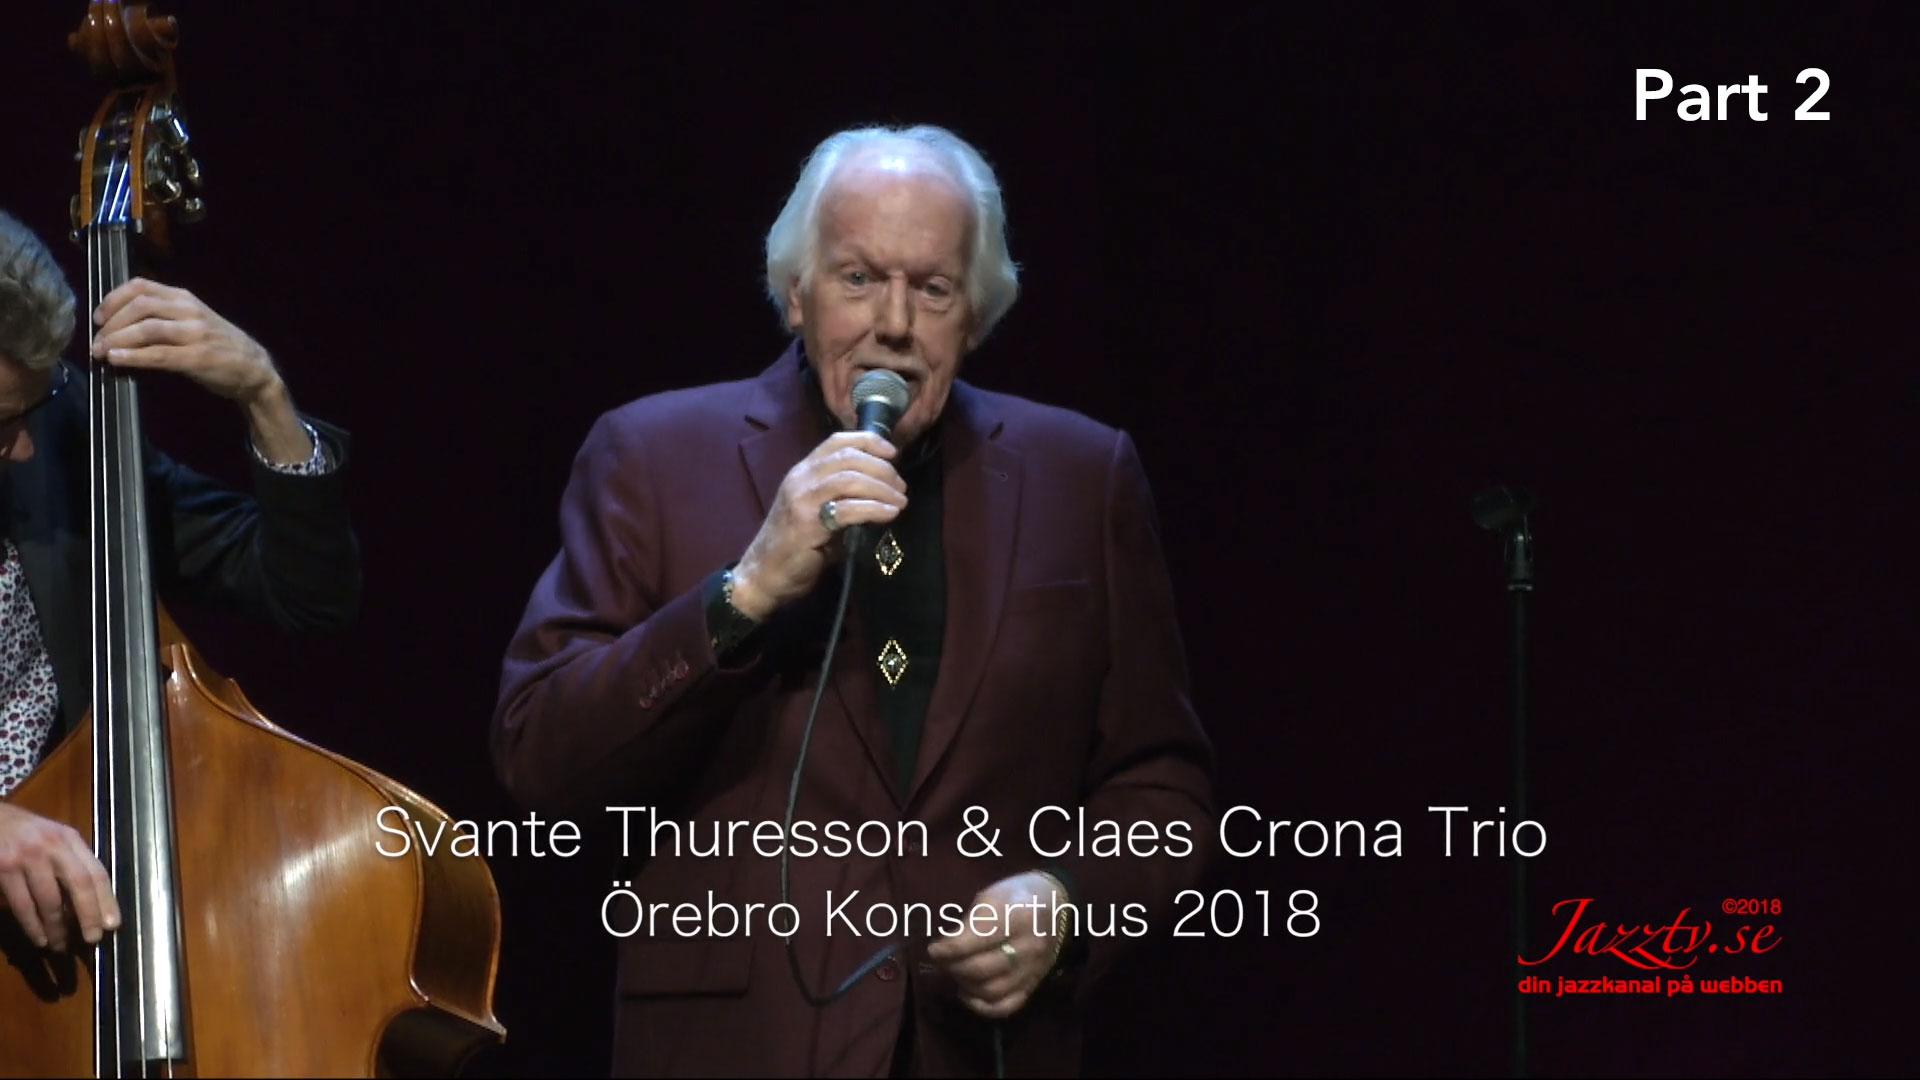 Svante Thuresson & Claes Crona Trio